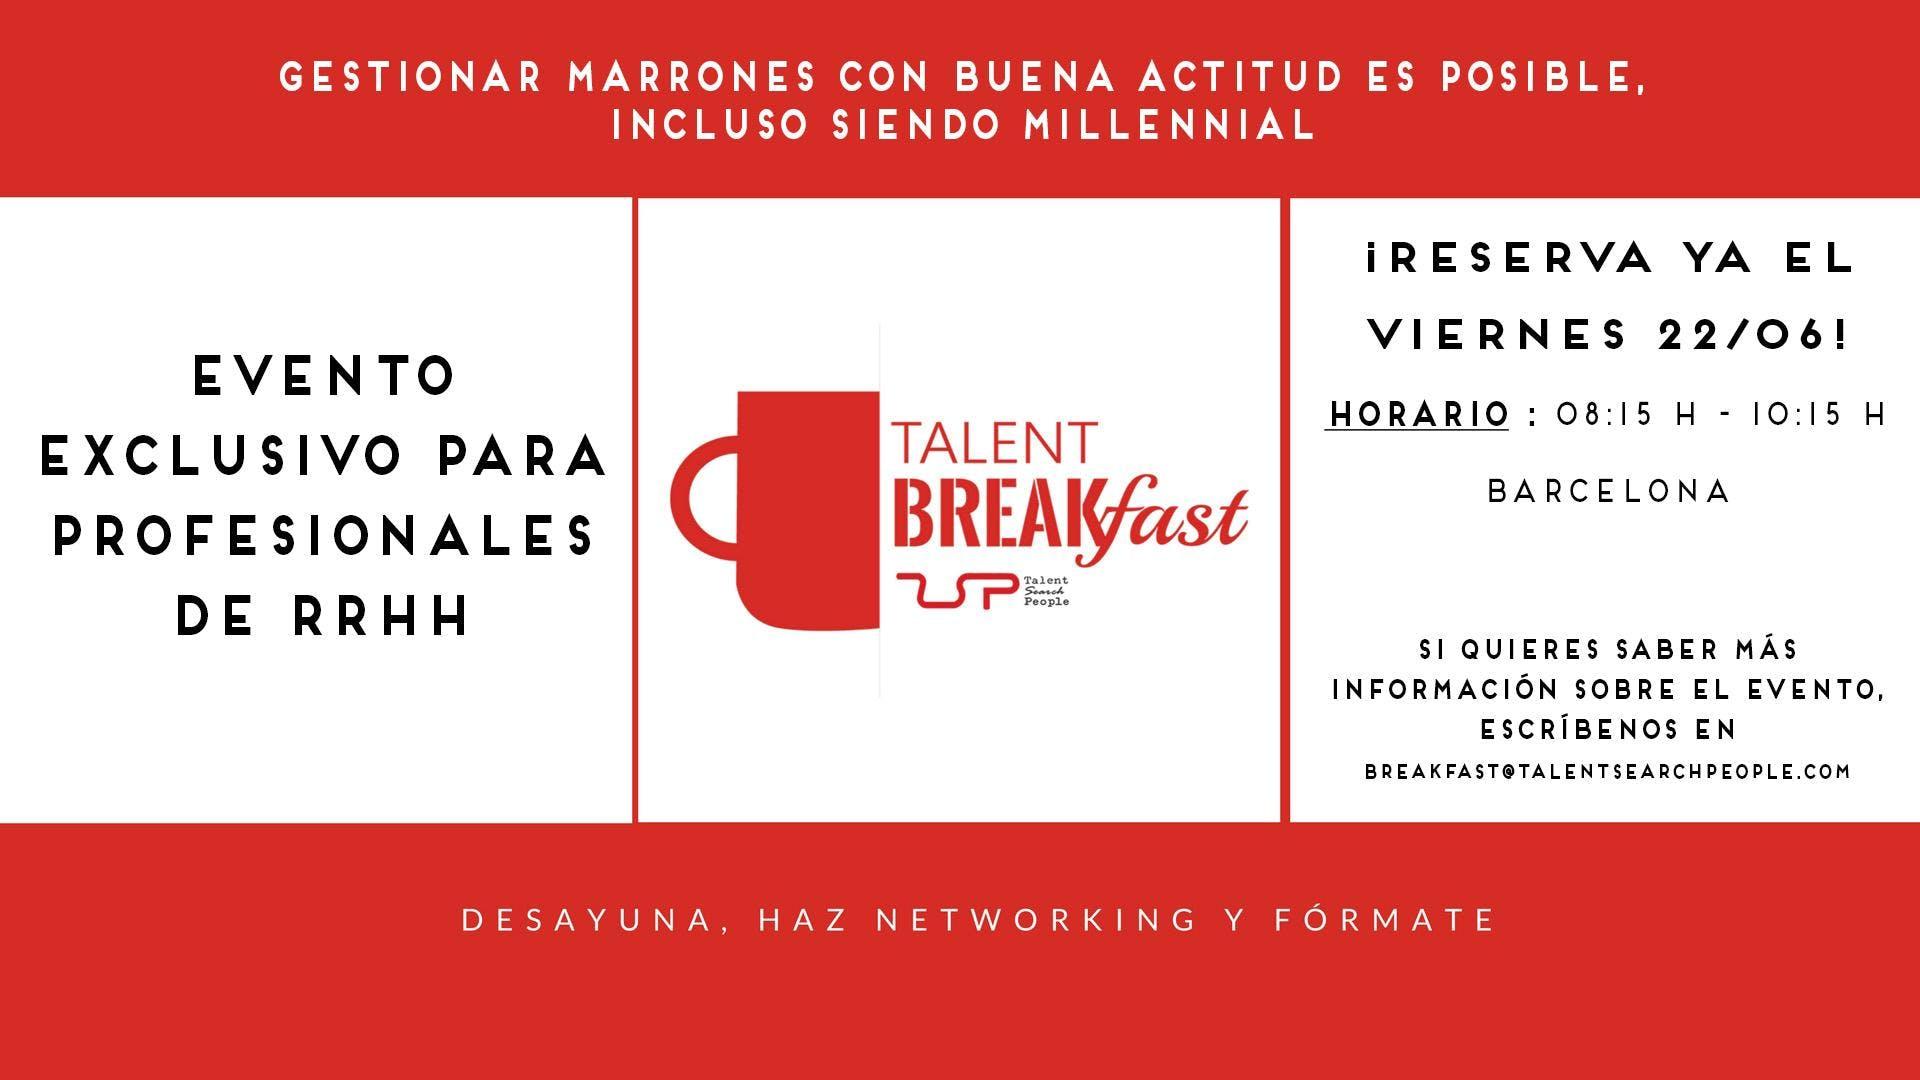 Talent Breakfast, evento dirigido a profesion